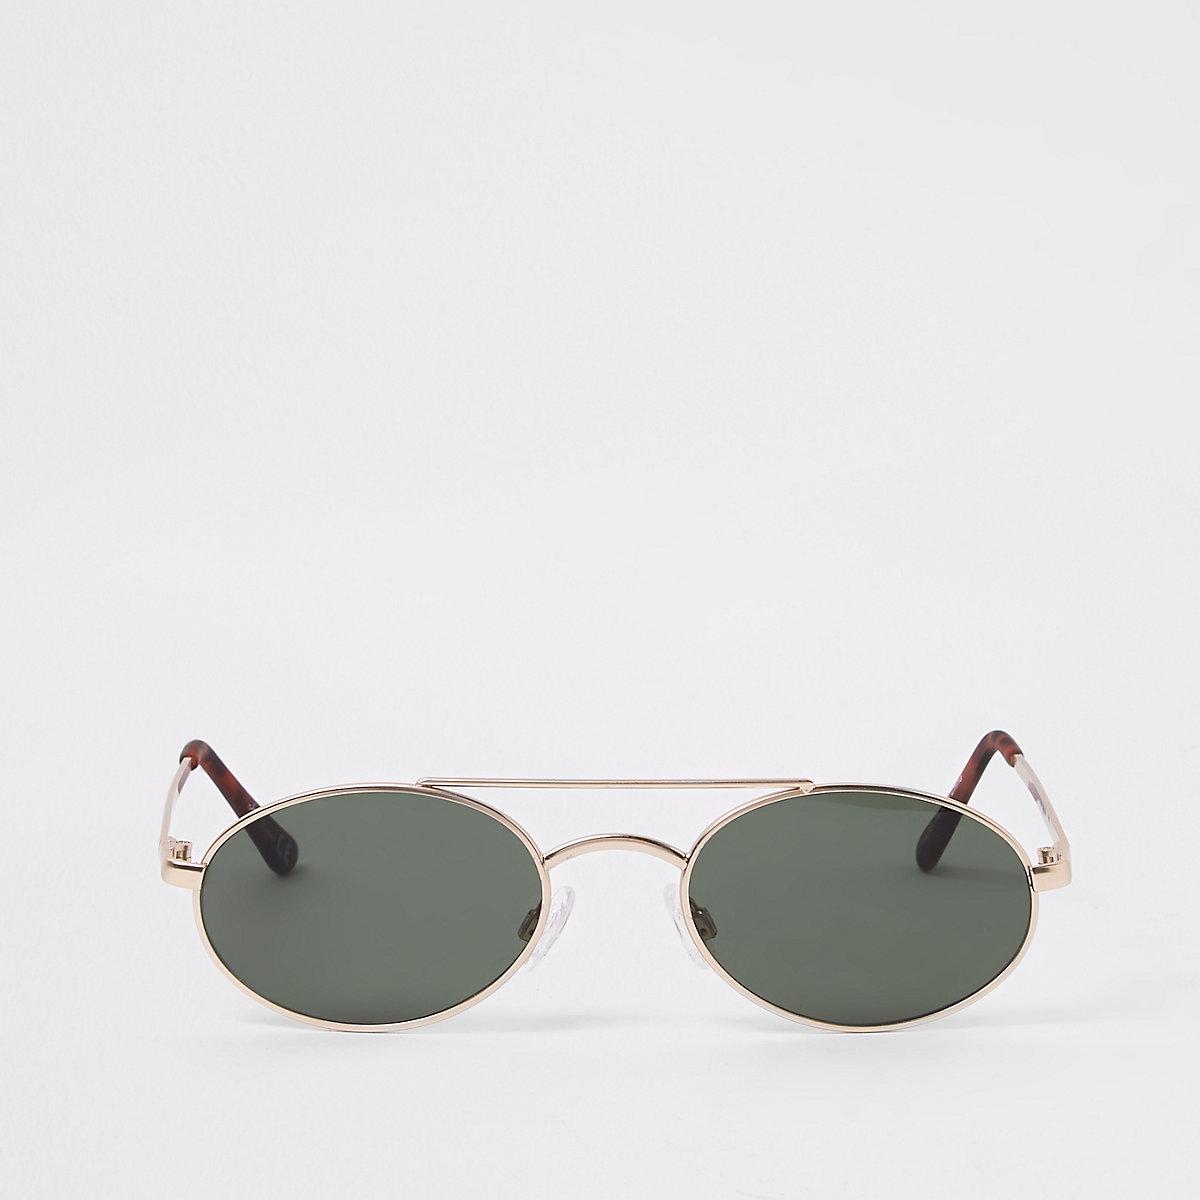 Jeepers Peepers grey aviator sunglasses